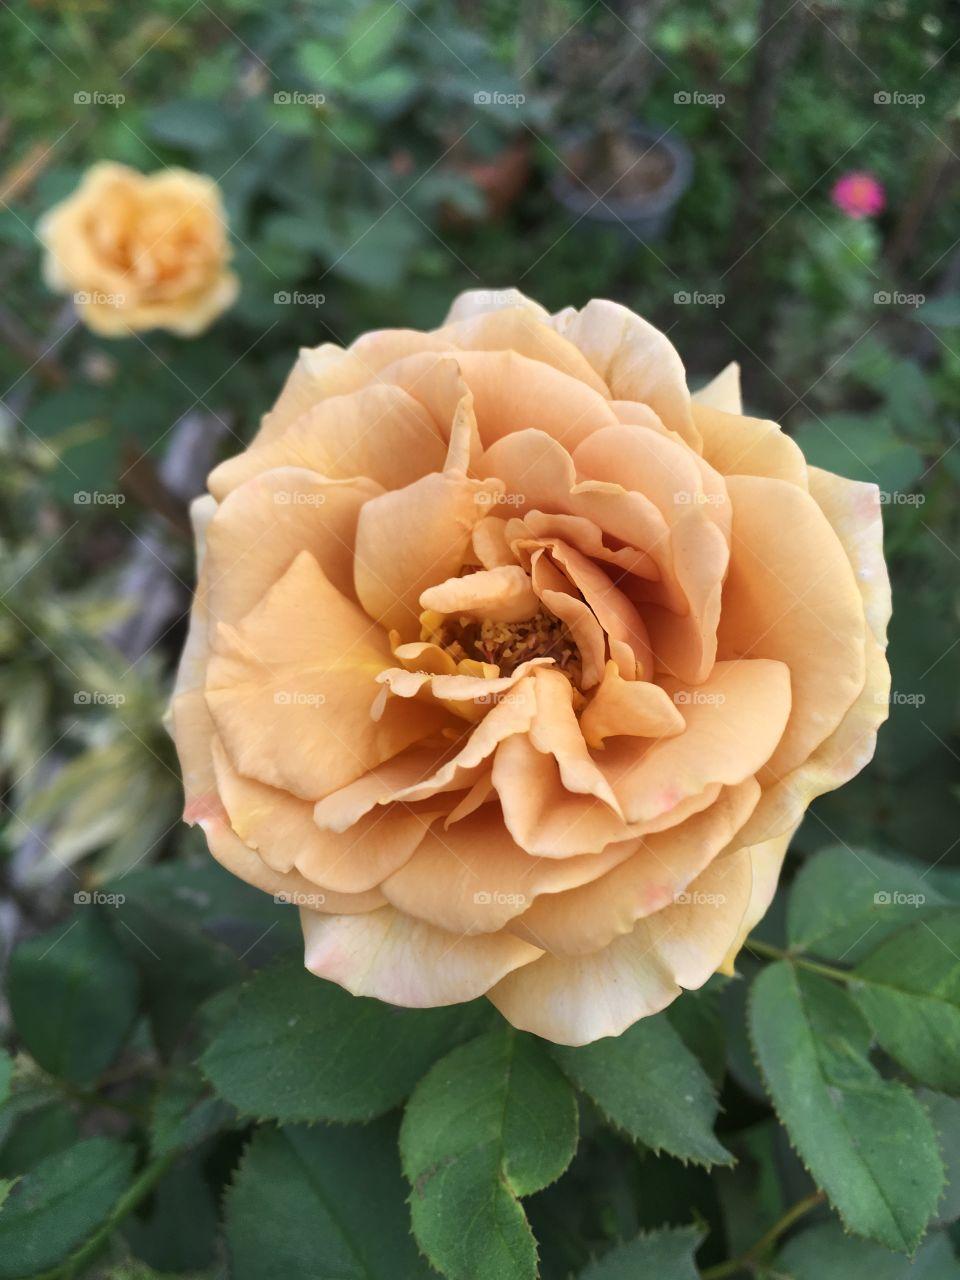 Rose flower in mature garden